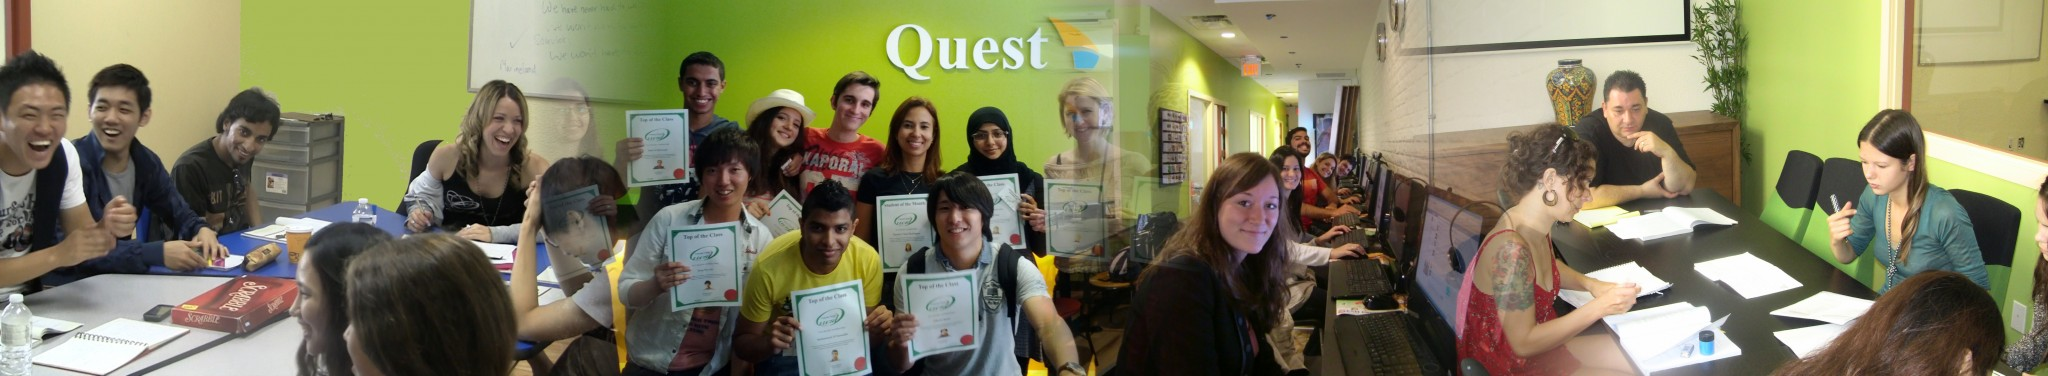 Quest Toronto2